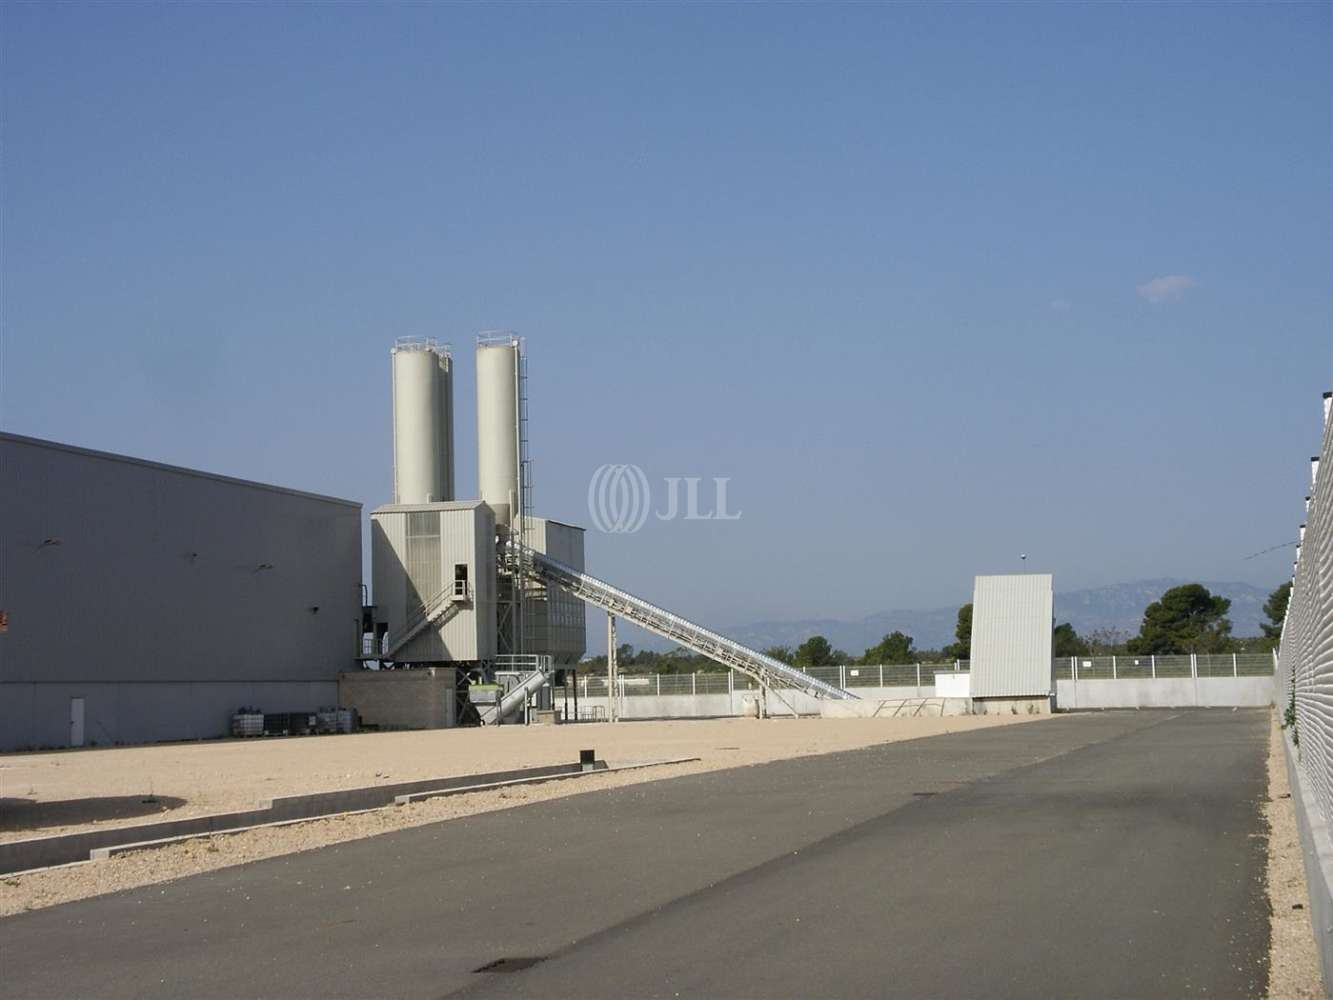 Naves industriales y logísticas Tortosa, 43500 - Nave Industrial - B0511 NAVE EN VENTA TORTOSA-CATALUNYA SUD